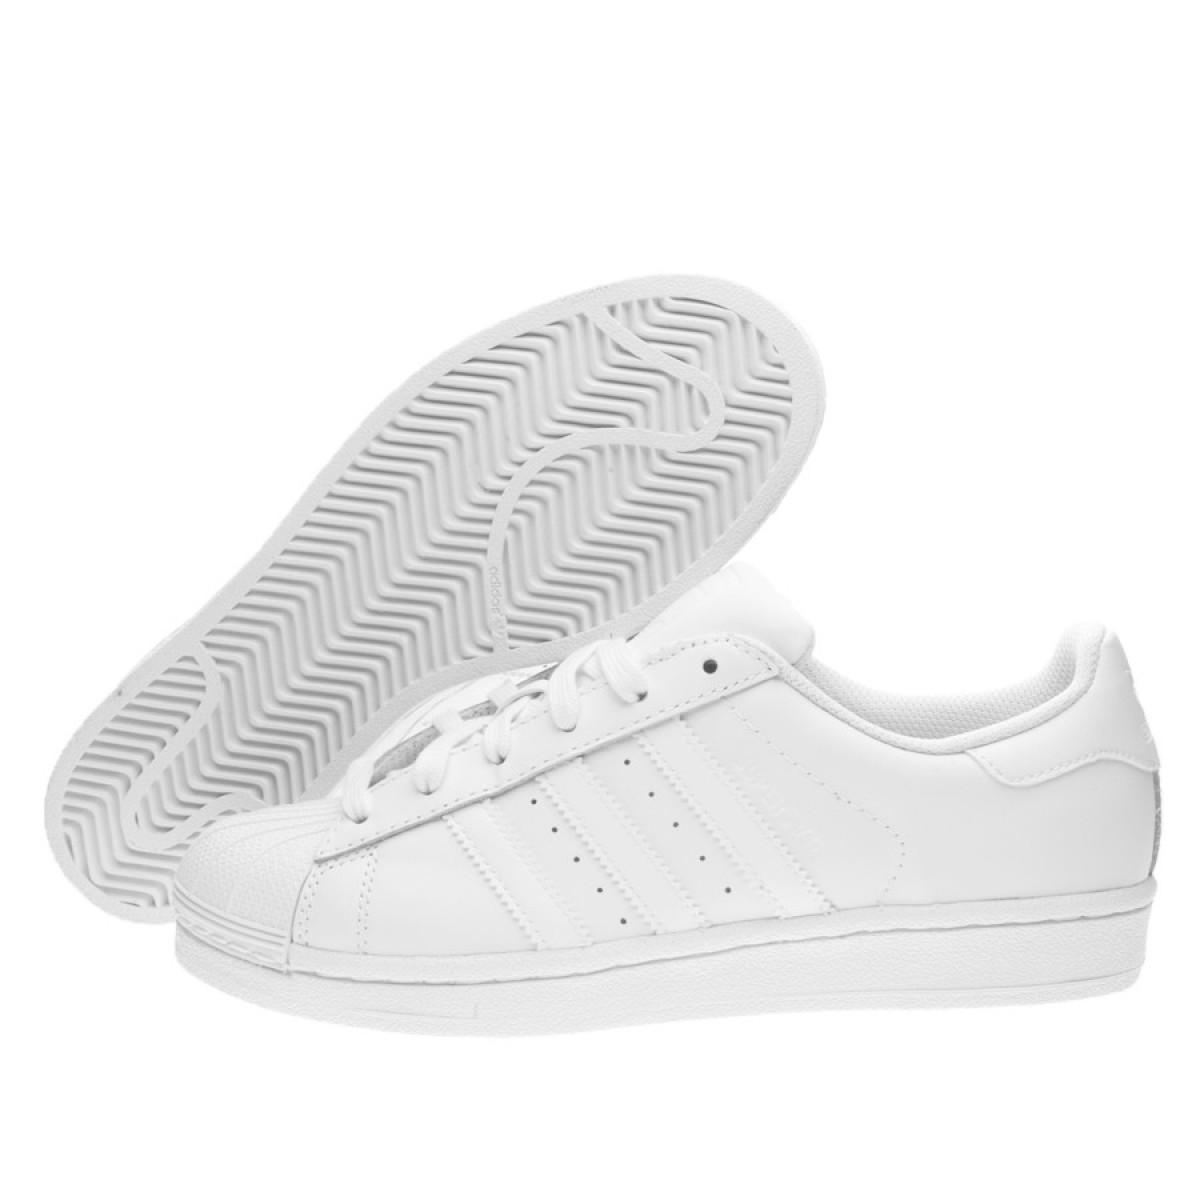 innovative design b7547 f8ed5 Adidas Superstar Foundation, Scarpe da Ginnastica Basse Unisex – Adulto  B27136. 82,00€. prev